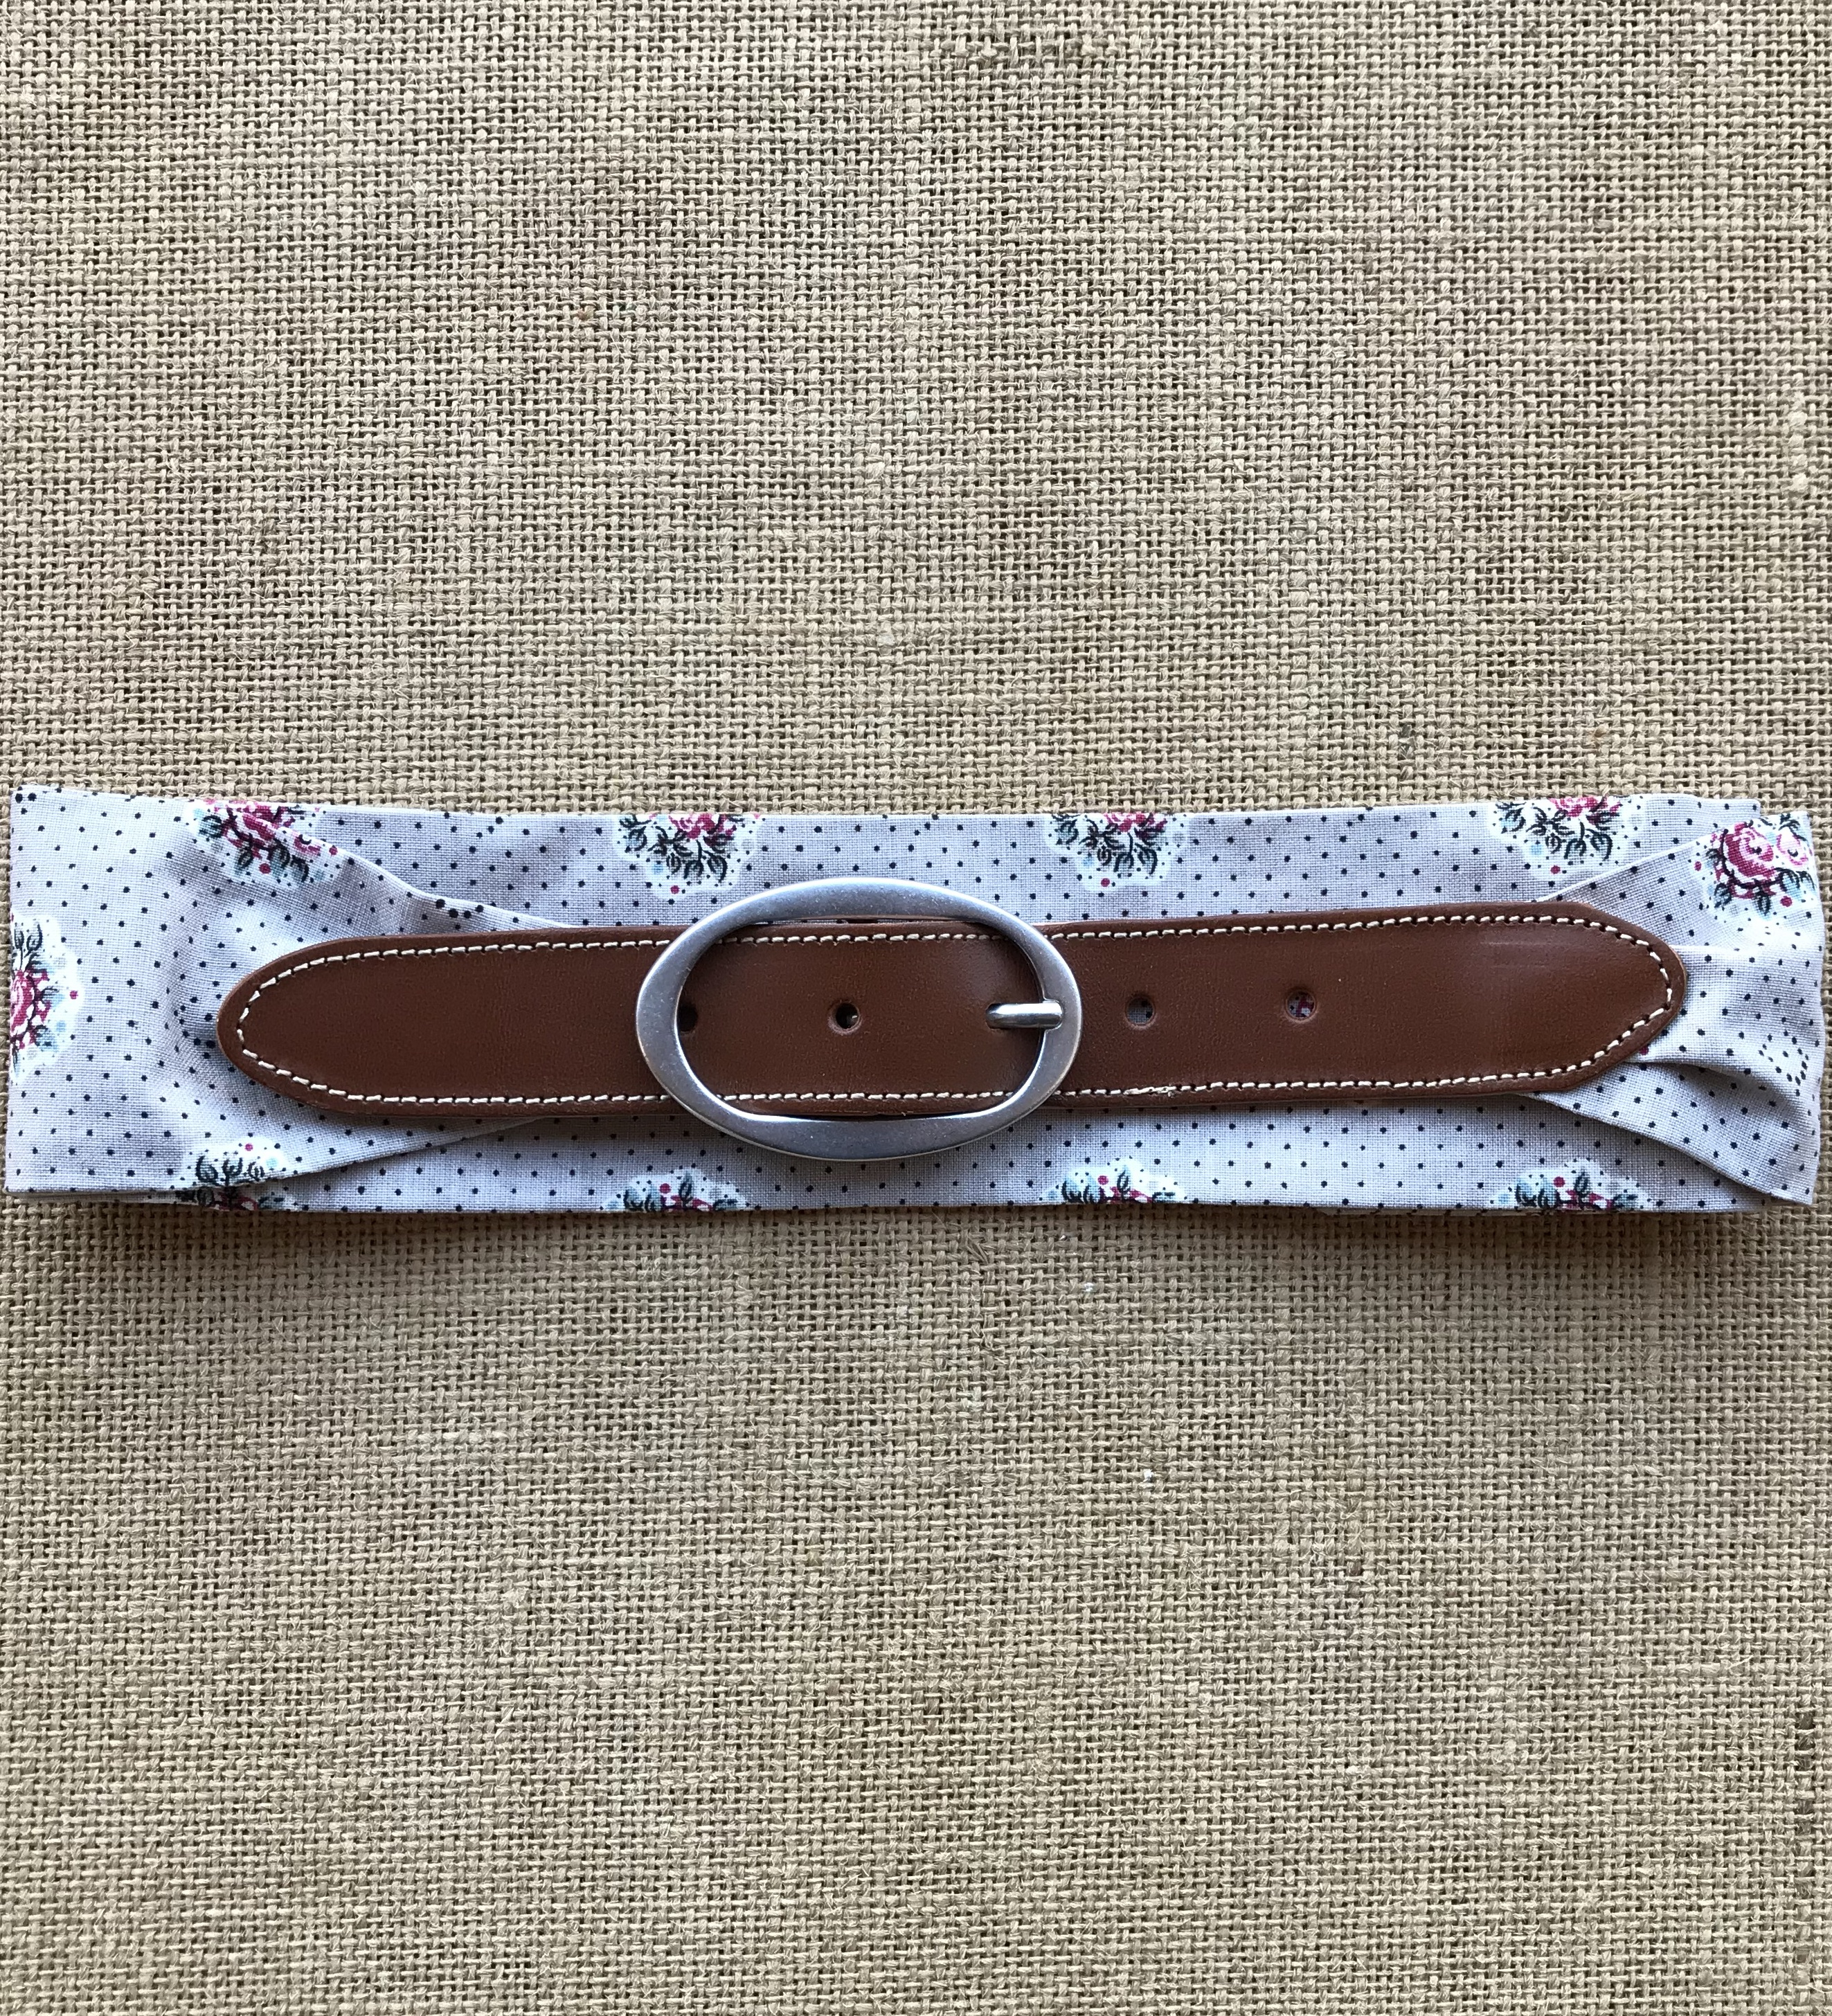 ceinture femme provence tissu provençal made in france cuir végétal